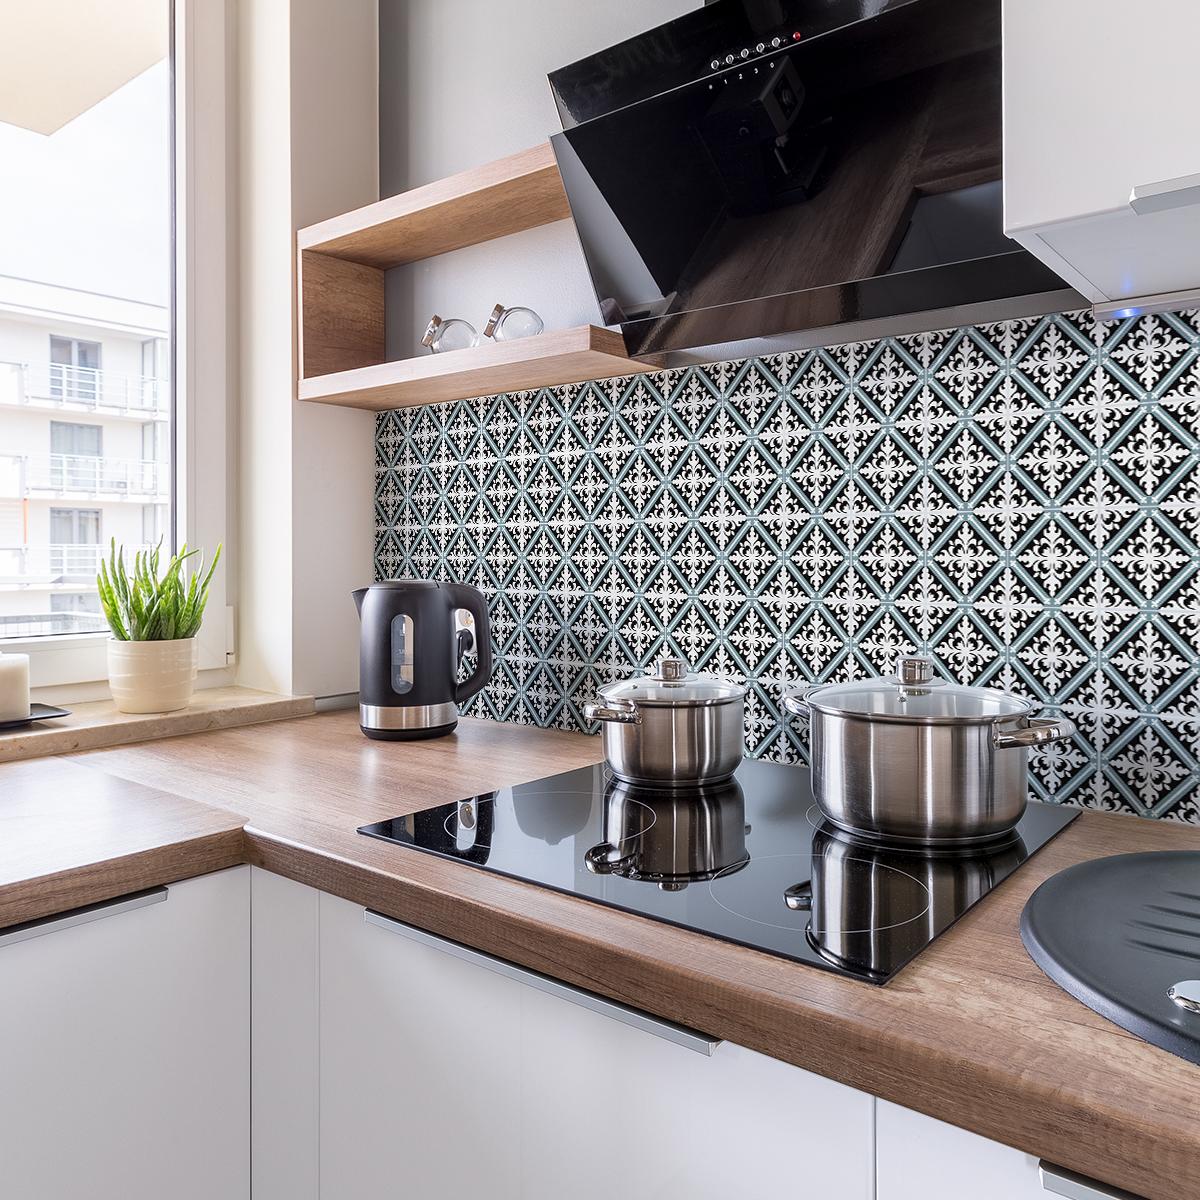 9 stickers carreaux de ciment azulejos laelia cuisine. Black Bedroom Furniture Sets. Home Design Ideas